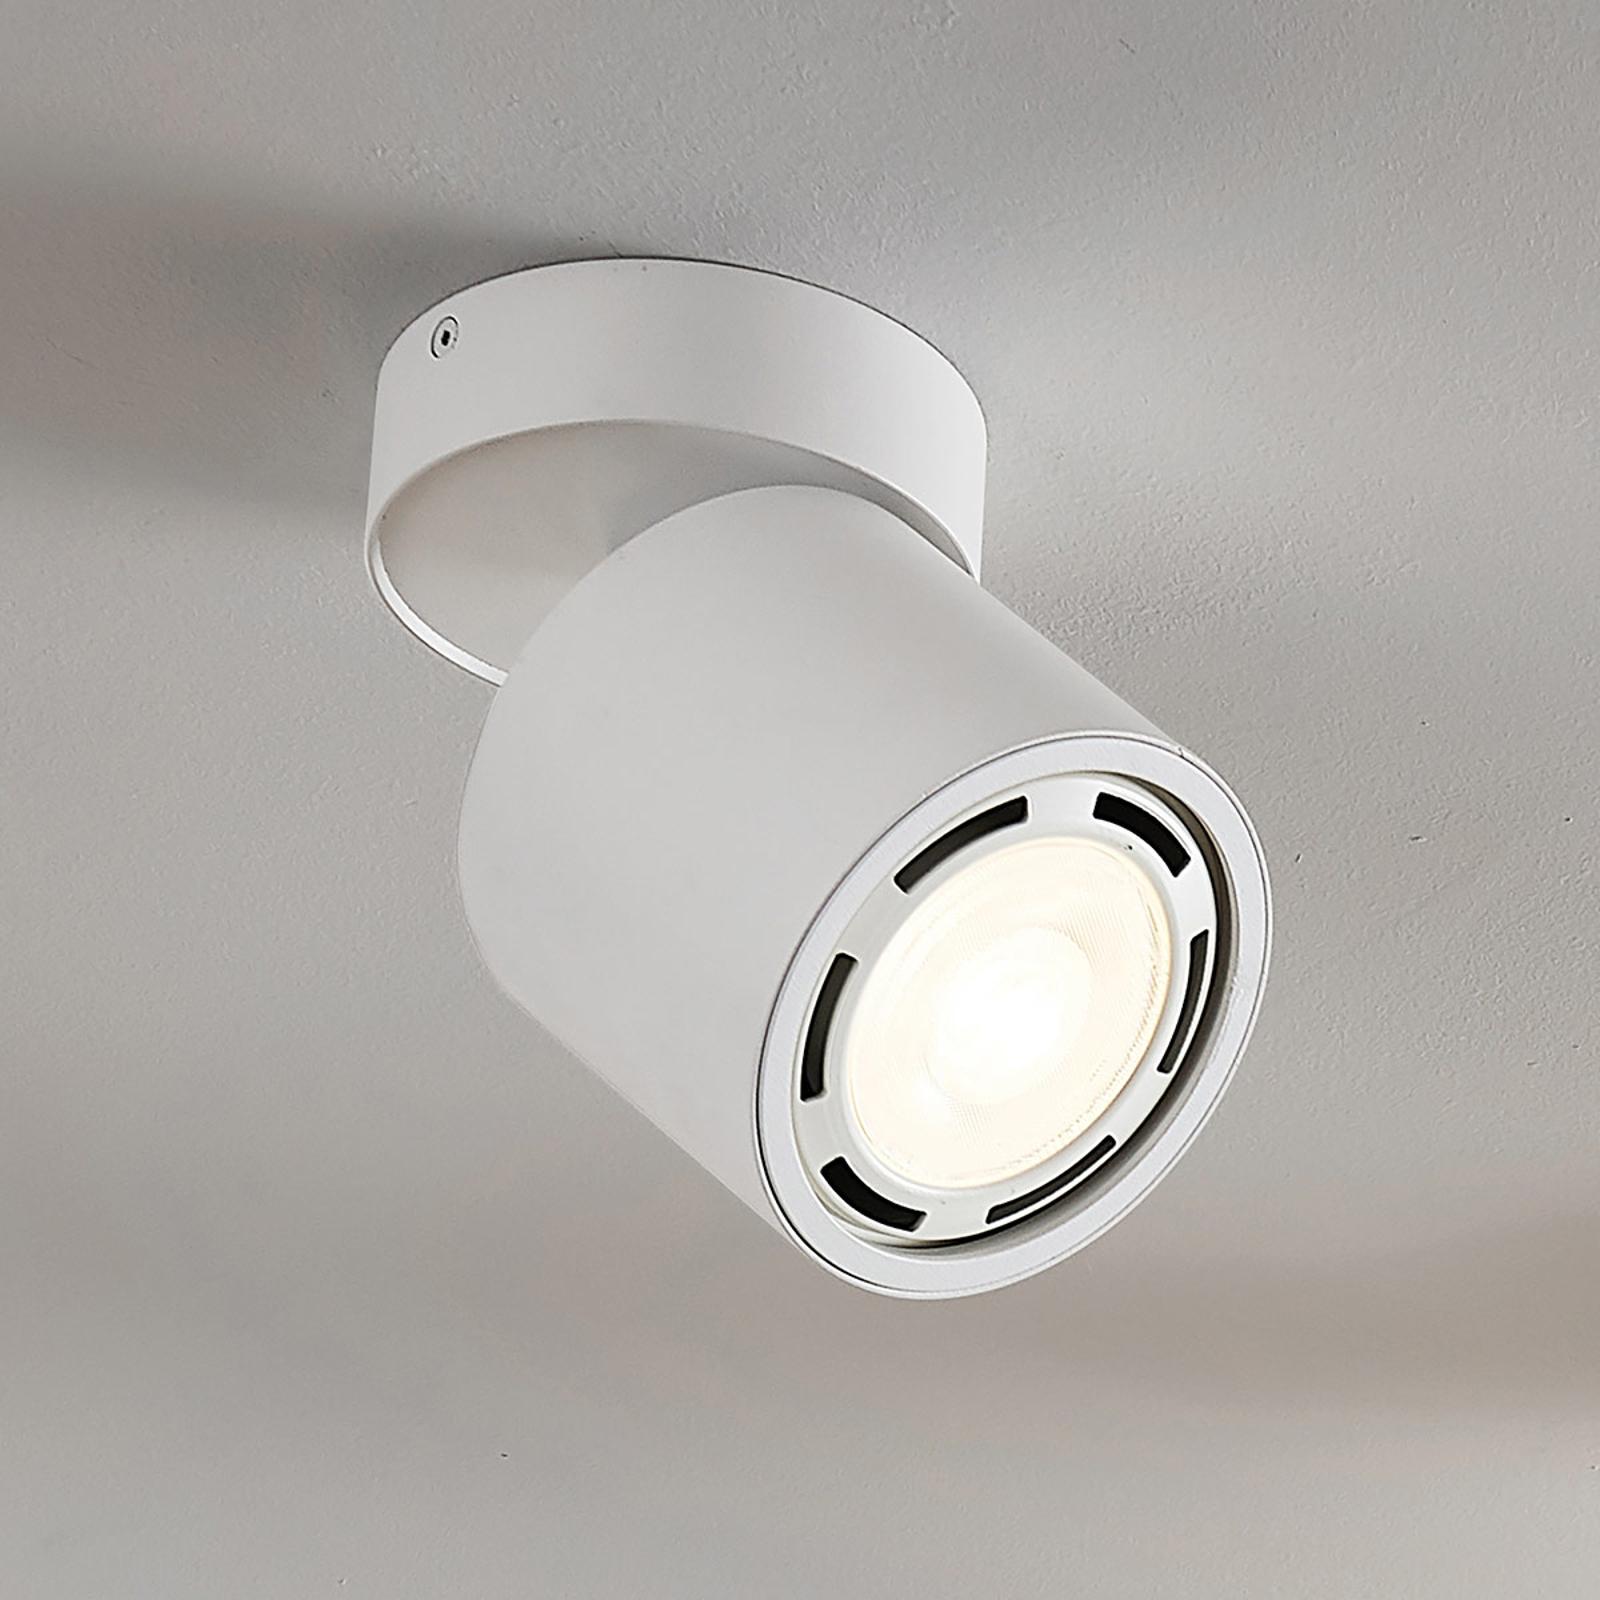 LED-spotlight Avantika i hvid, dæmpbar